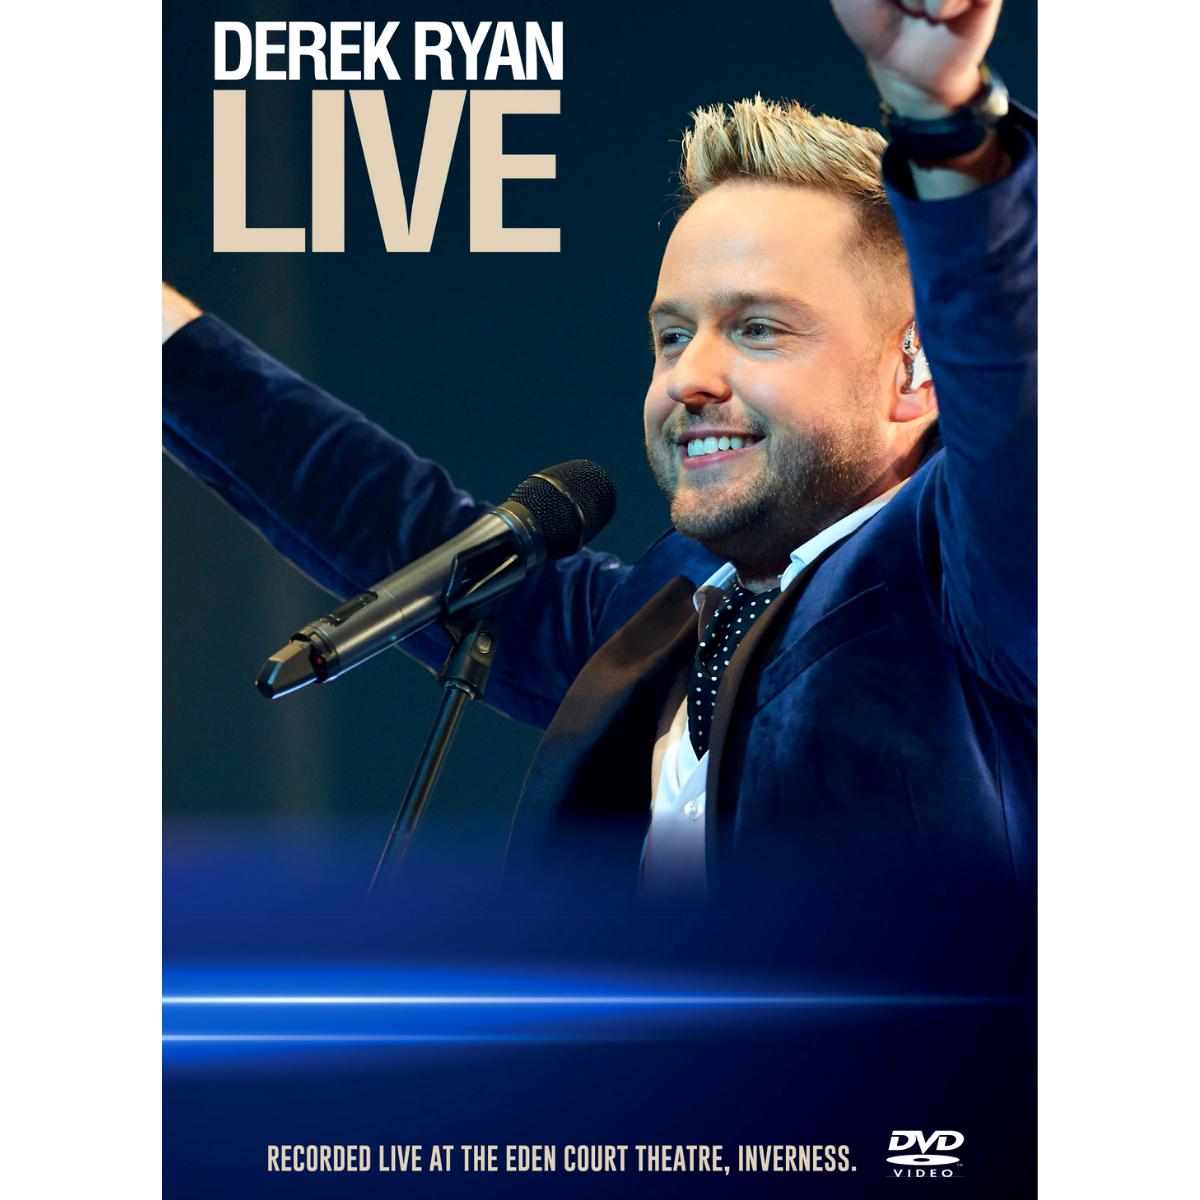 Derek Ryan LIVE Concert DVD